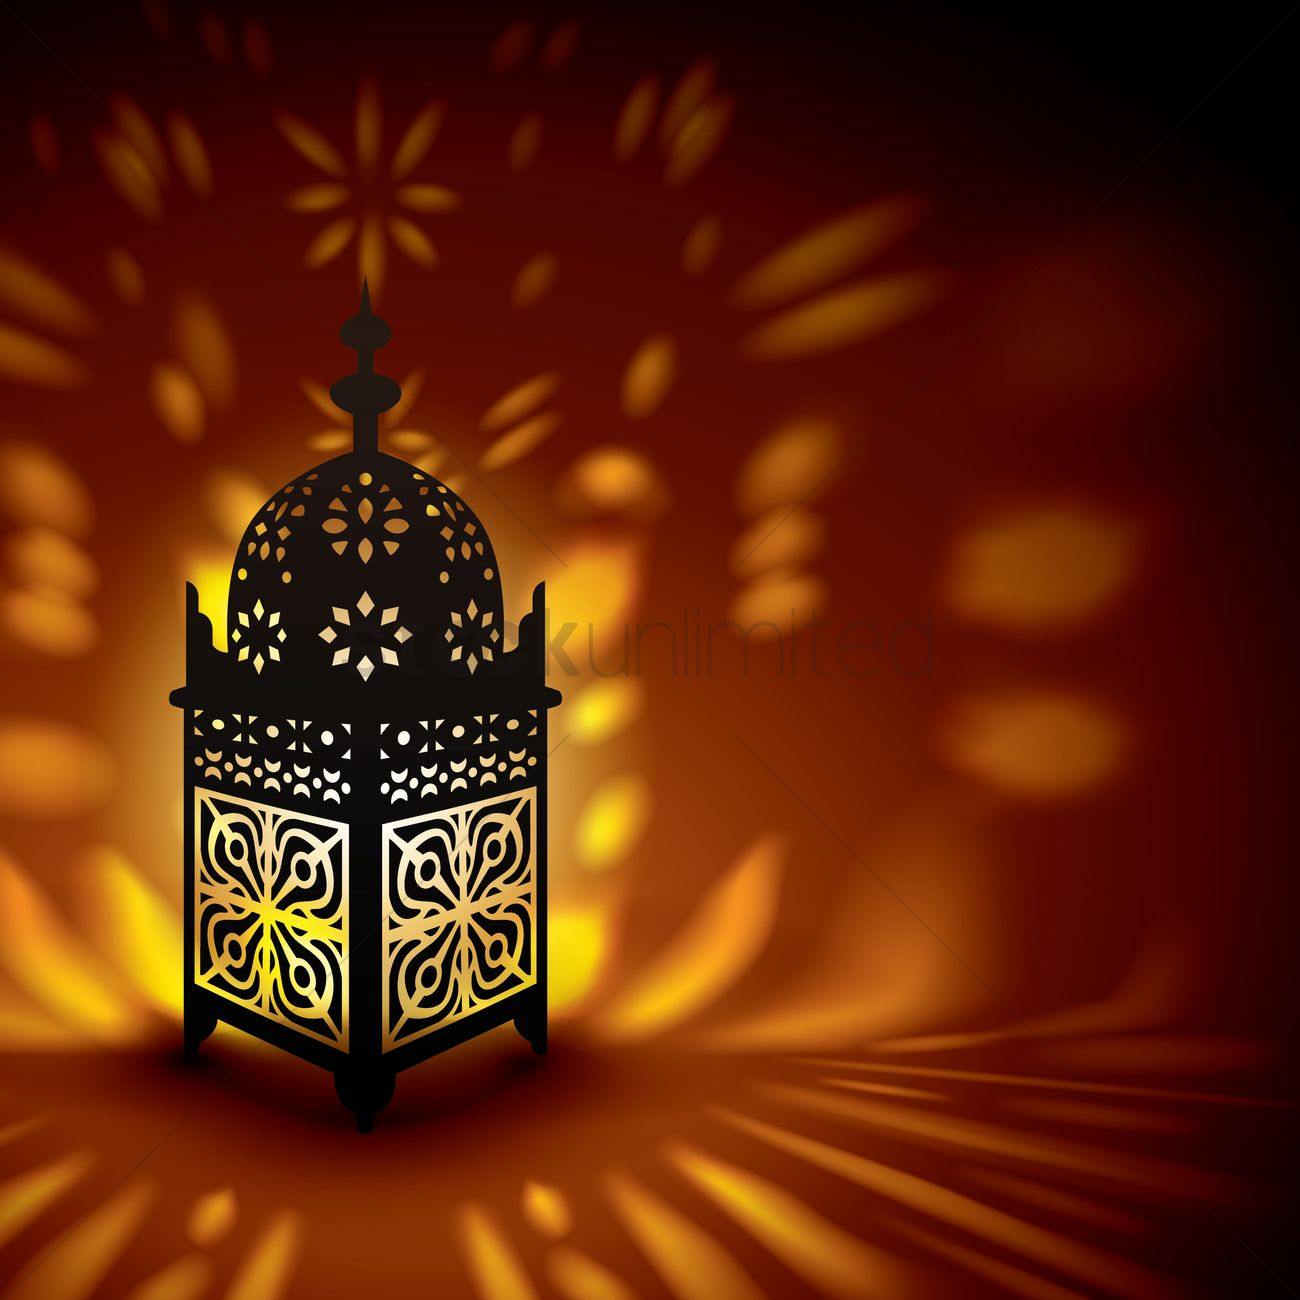 a lit ramadan lantern vector image 1826849 stockunlimited a lit ramadan lantern vector image